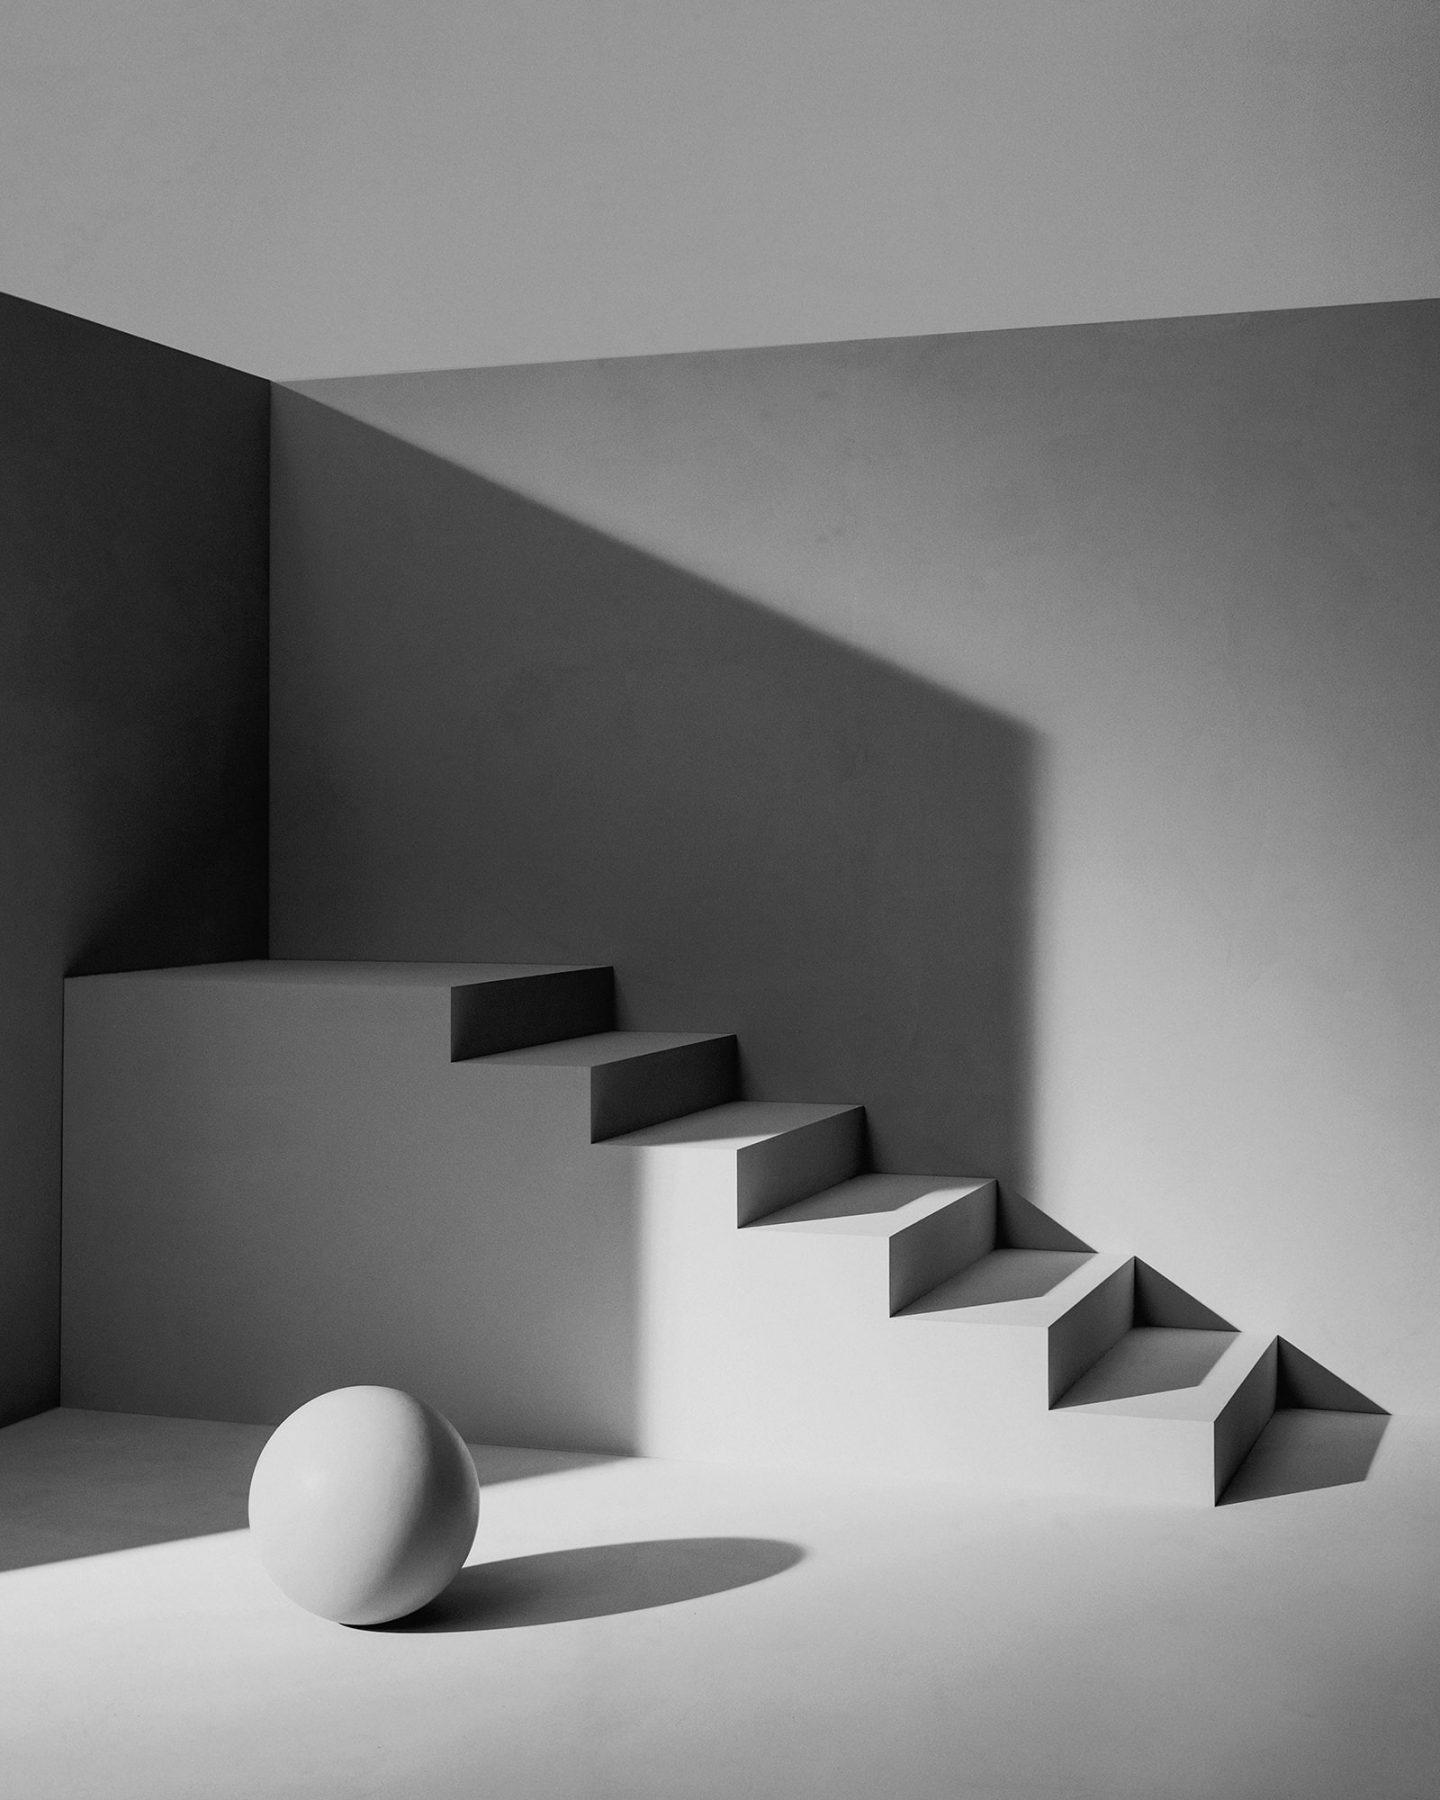 IGNANT-Jonas-Bjerre-Poulsen-Reinvention-of-Forms-01